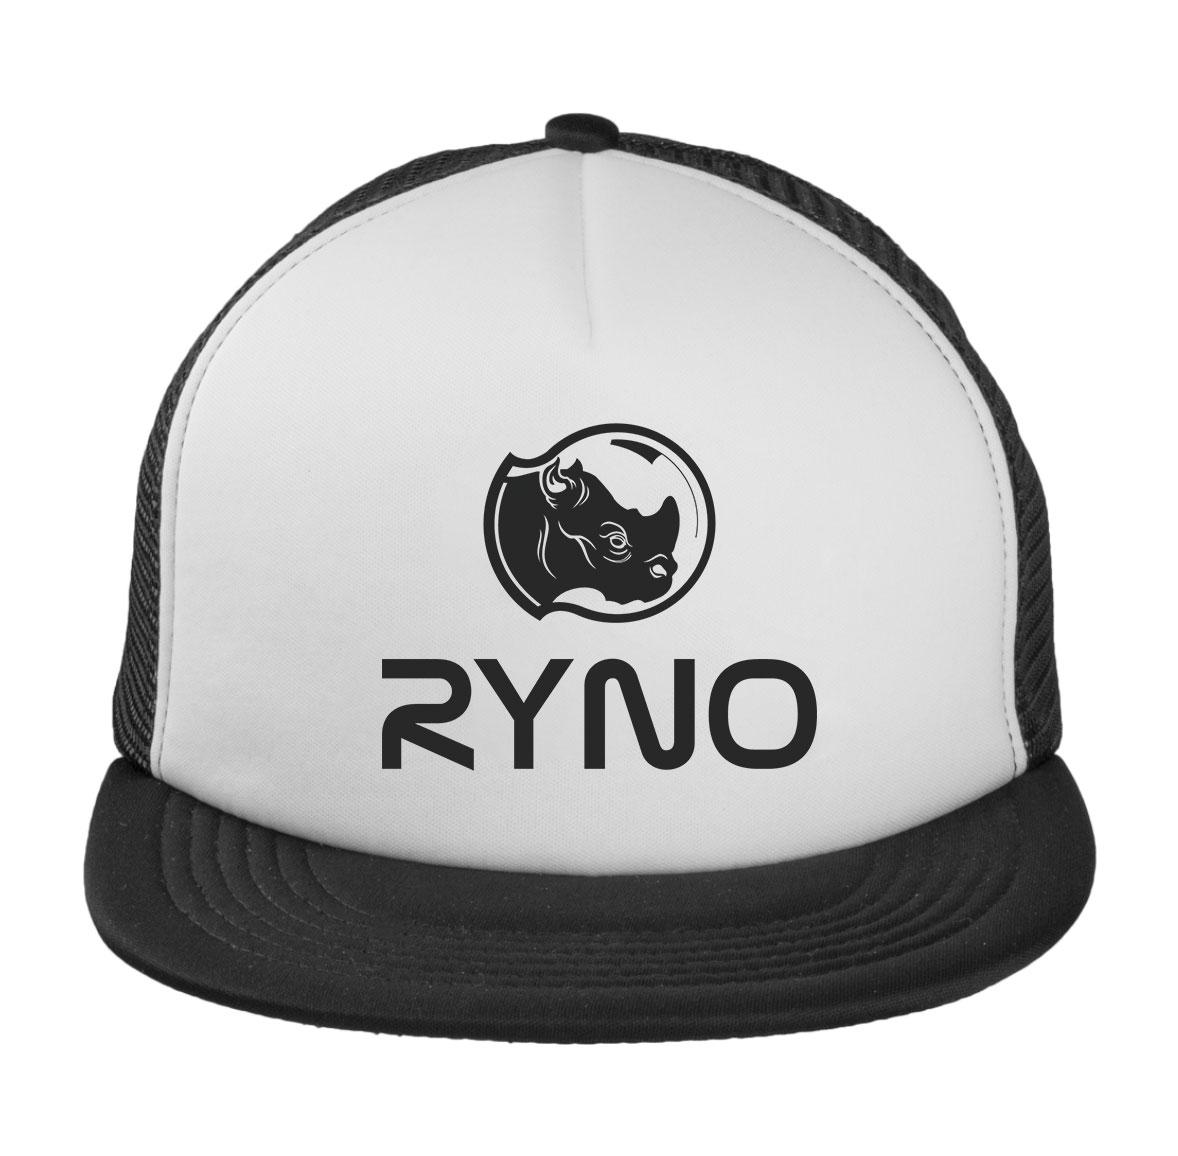 Mesh Baseball Cap (Black) | $15.00